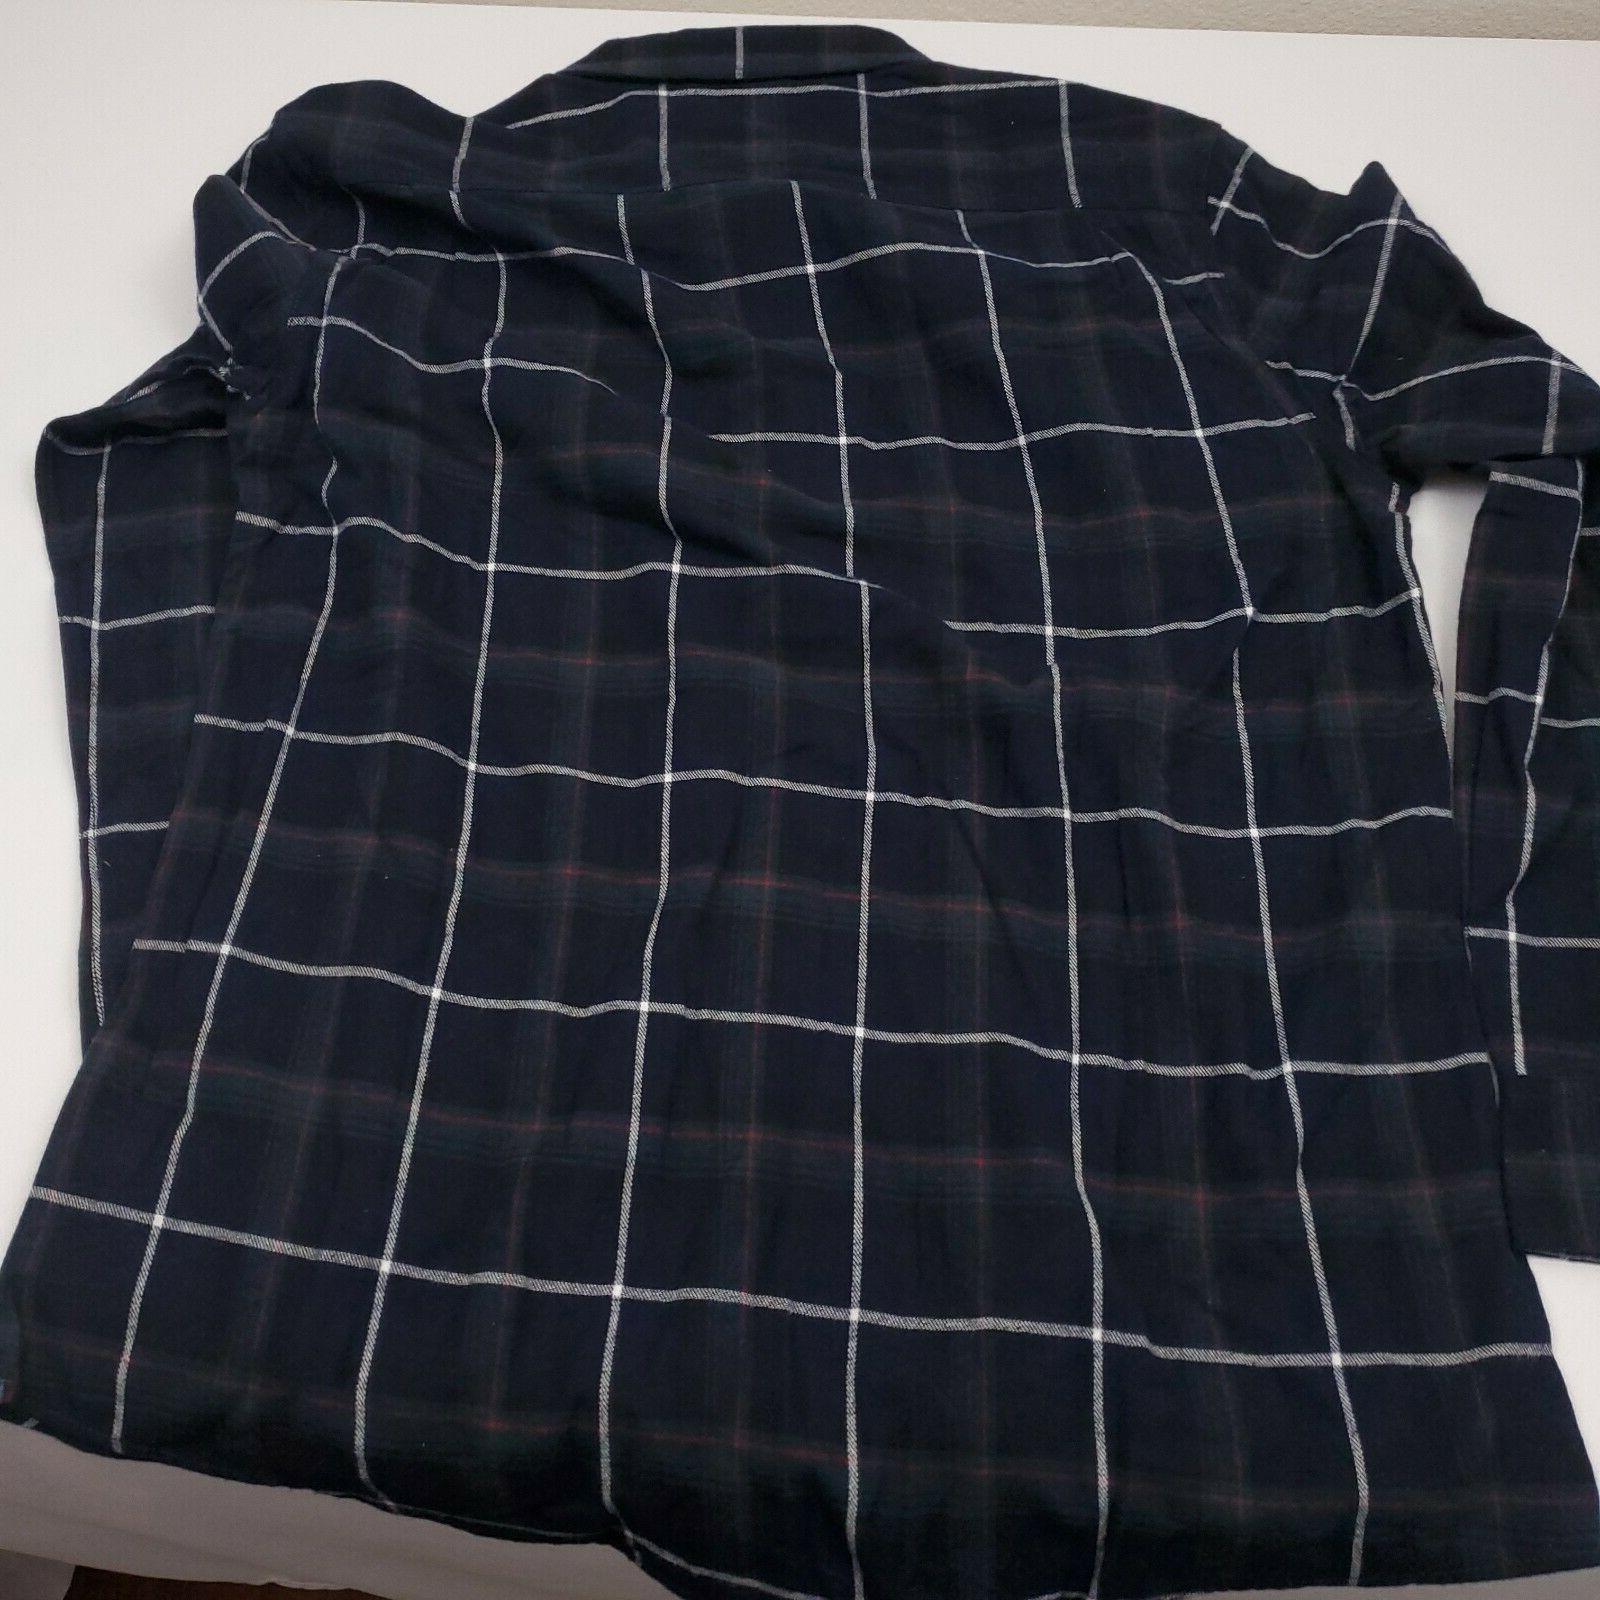 Weatherproof Vintage Men's Flannel Shirt Long Sleeve 100% Cotton Blue